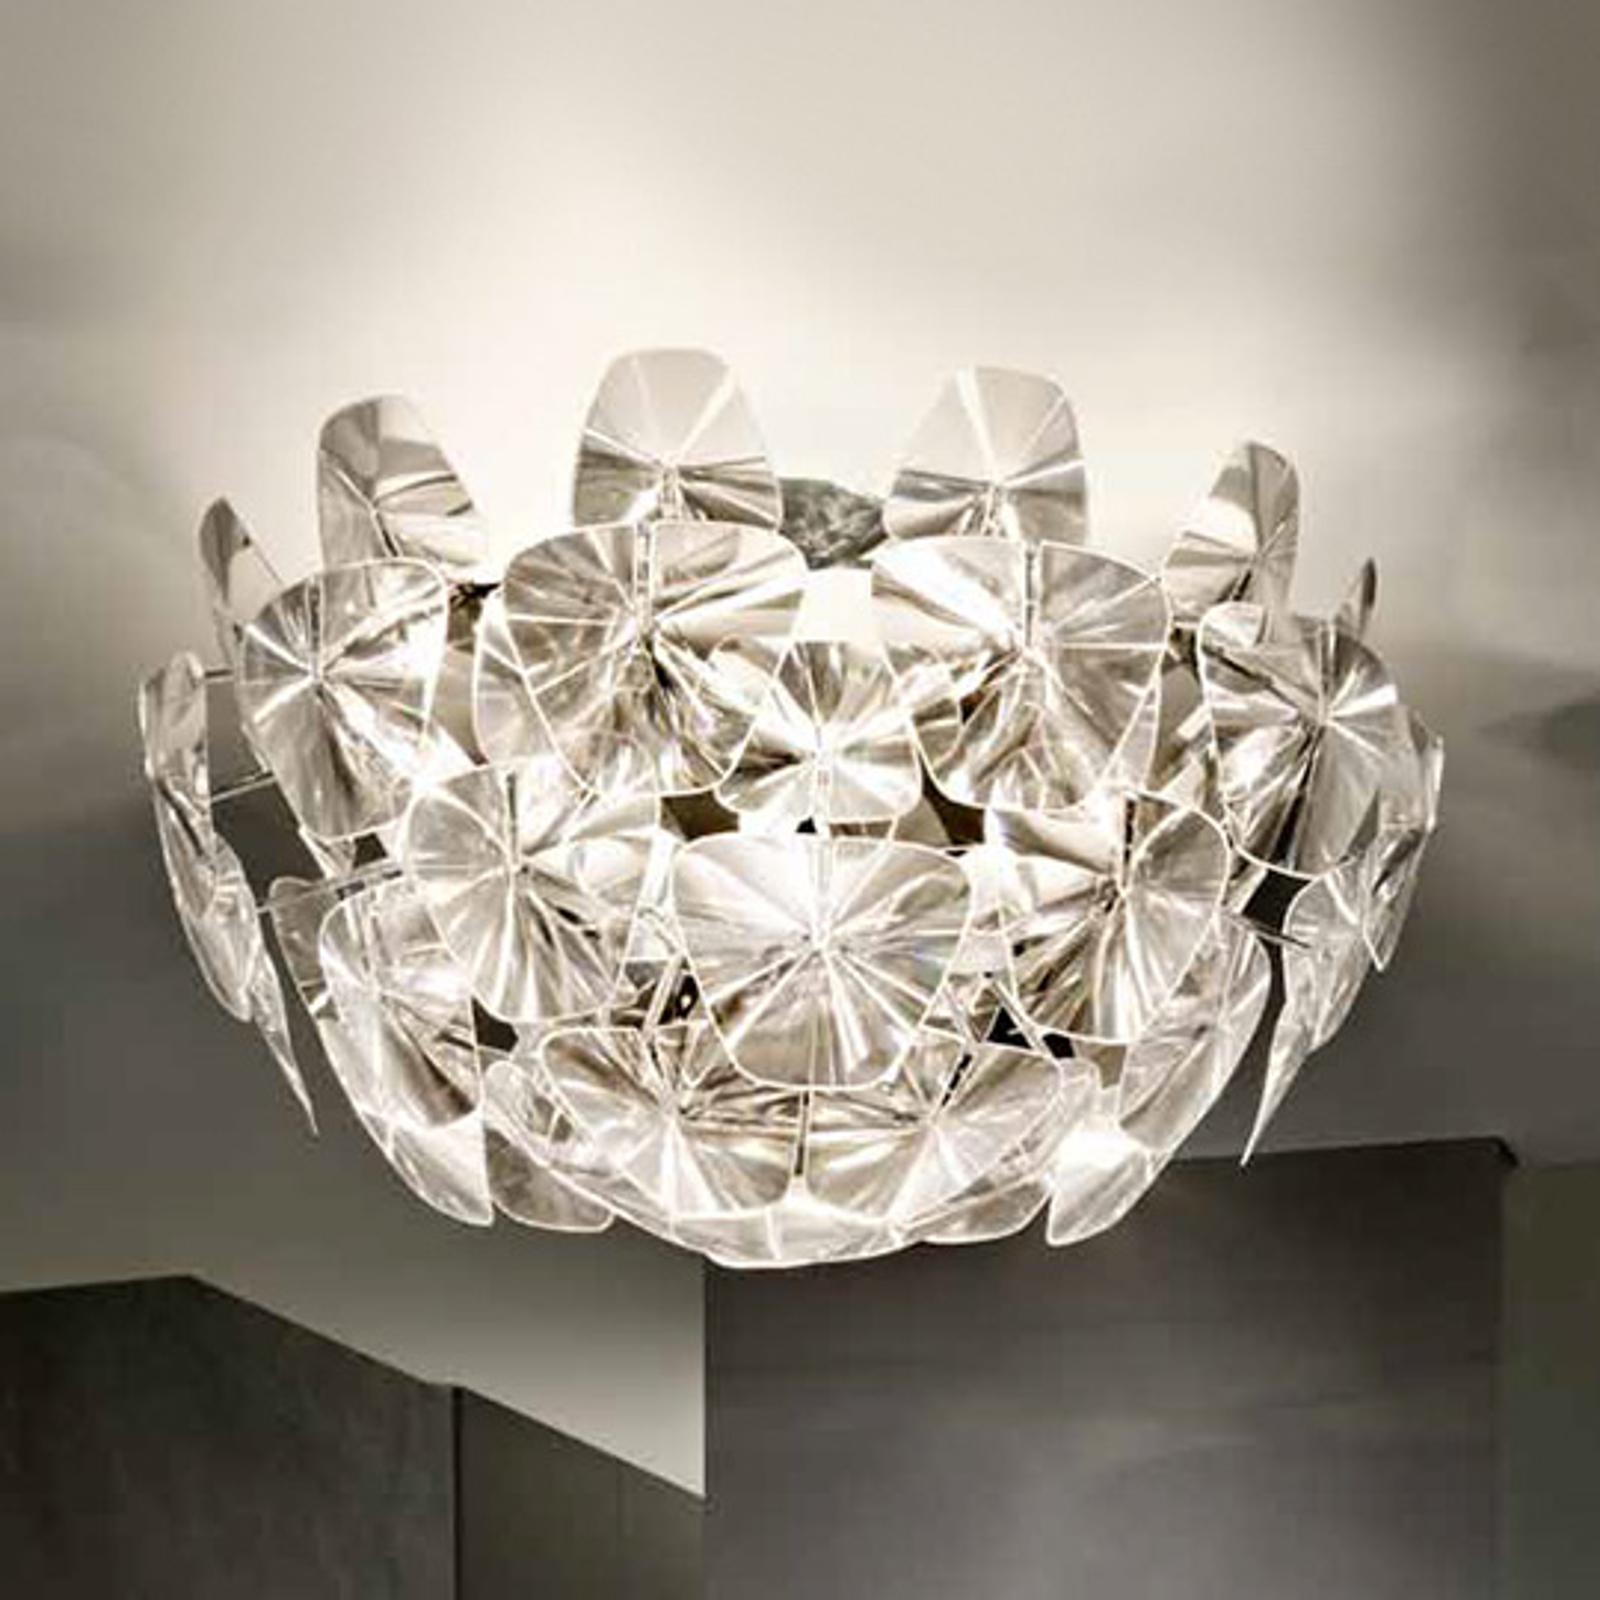 Grote design plafondlamp Hope